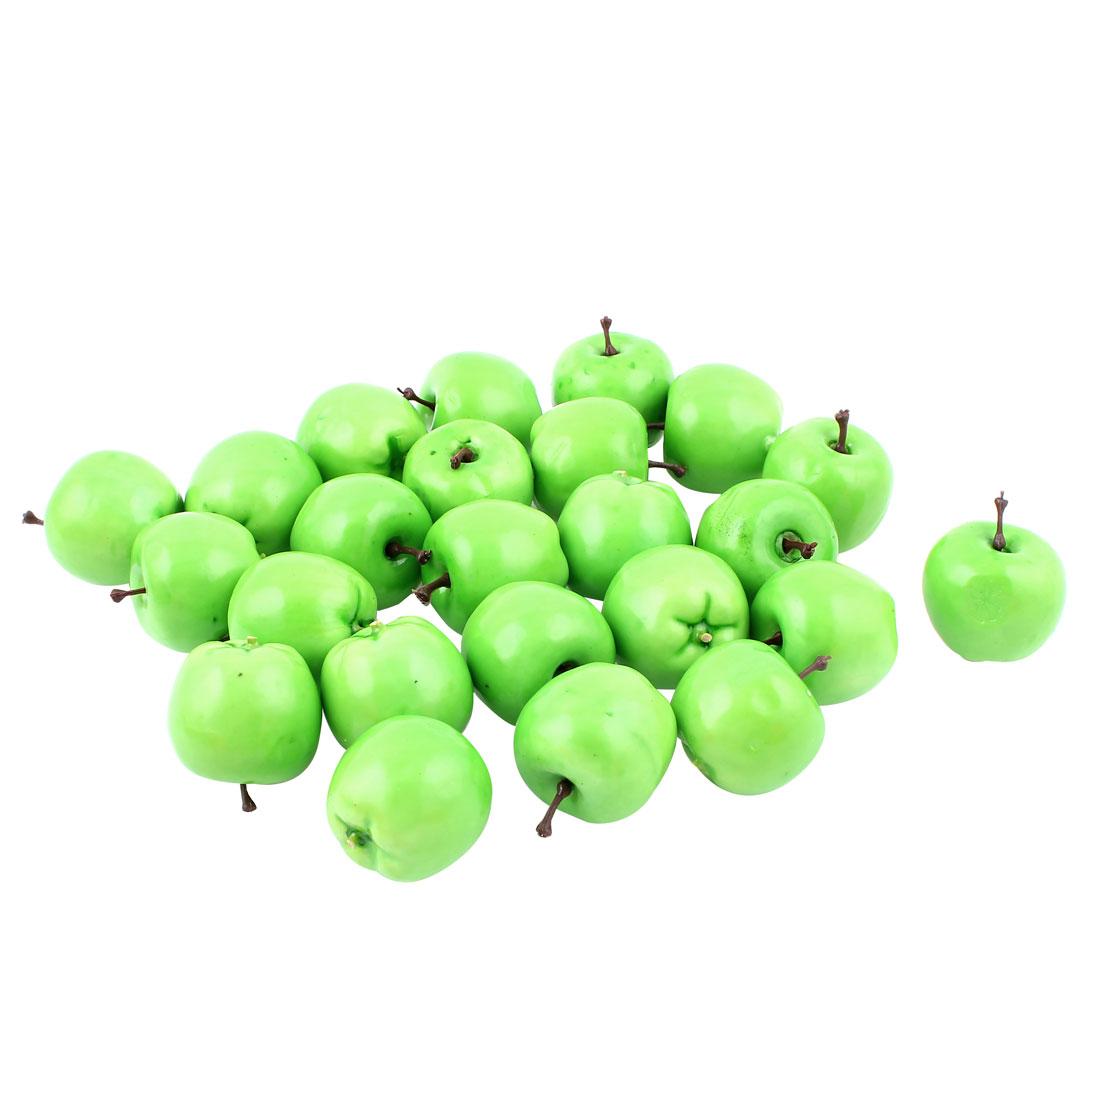 24 Pcs Artificial Fake Plastic Mini Green Apple Fruit Kitchen Table Decoration